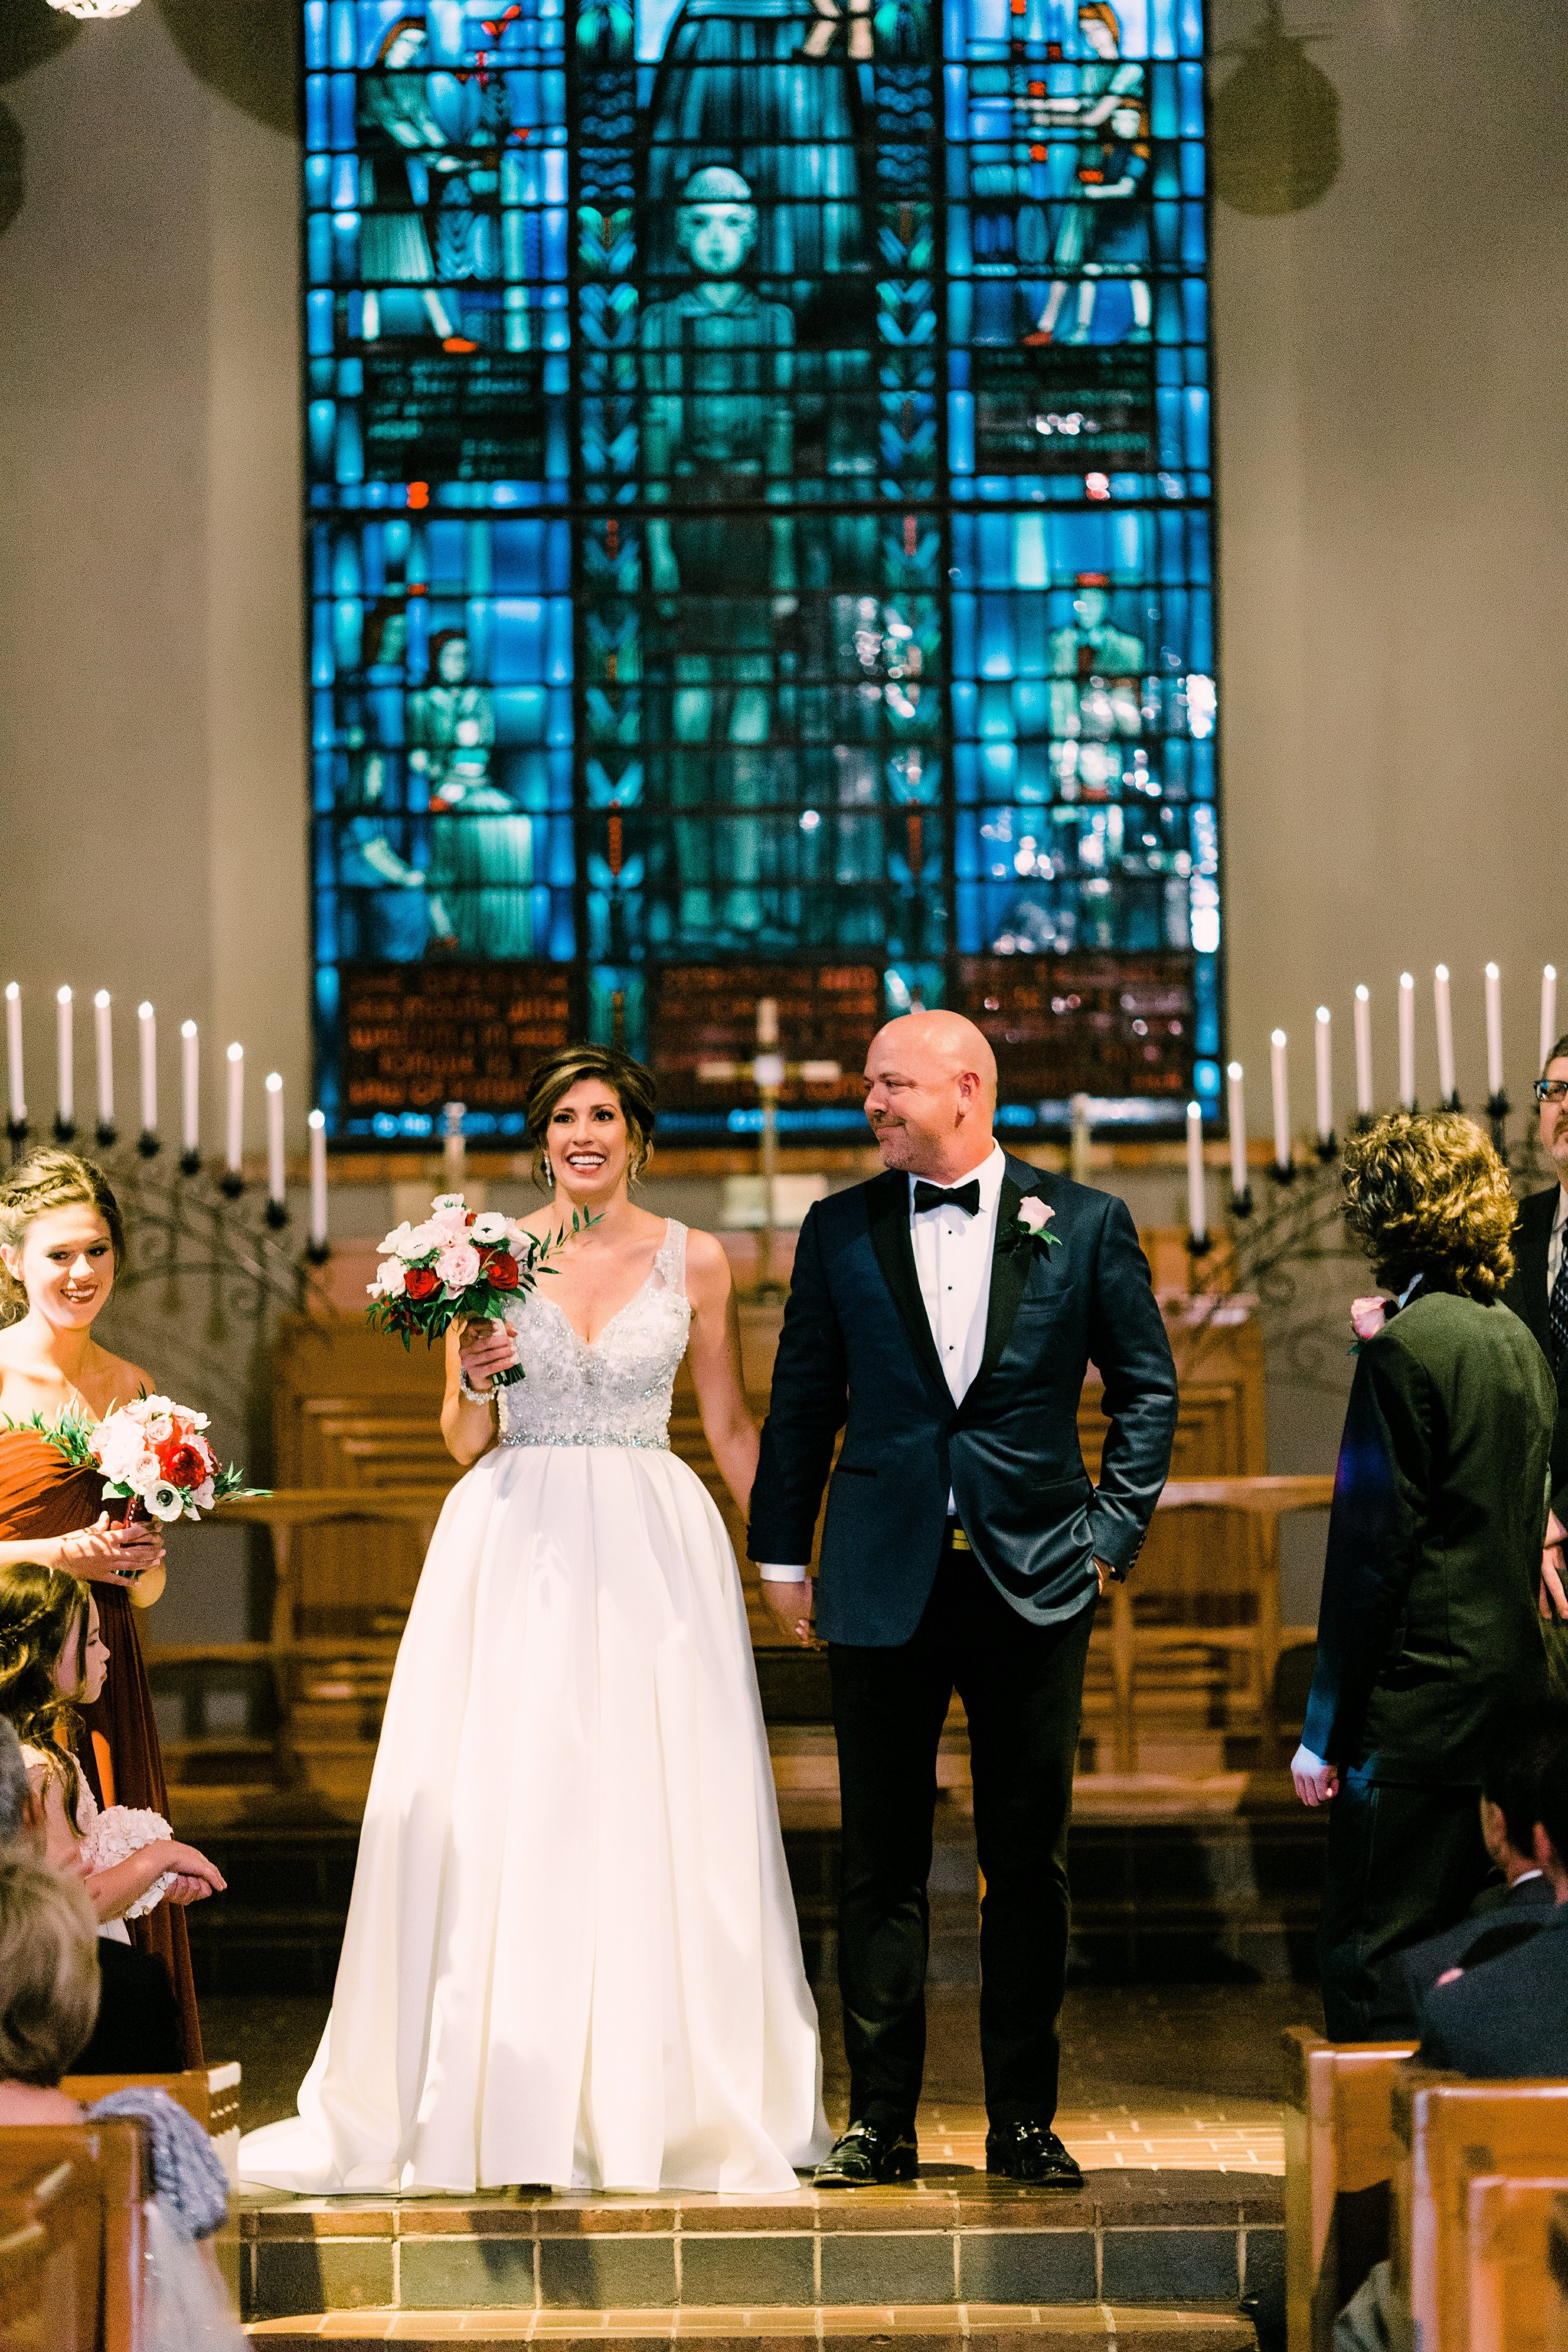 haehn-wedding-little-chapel-in-the-woods-denton-tx-lantana-golf-club-wedding-036.jpg